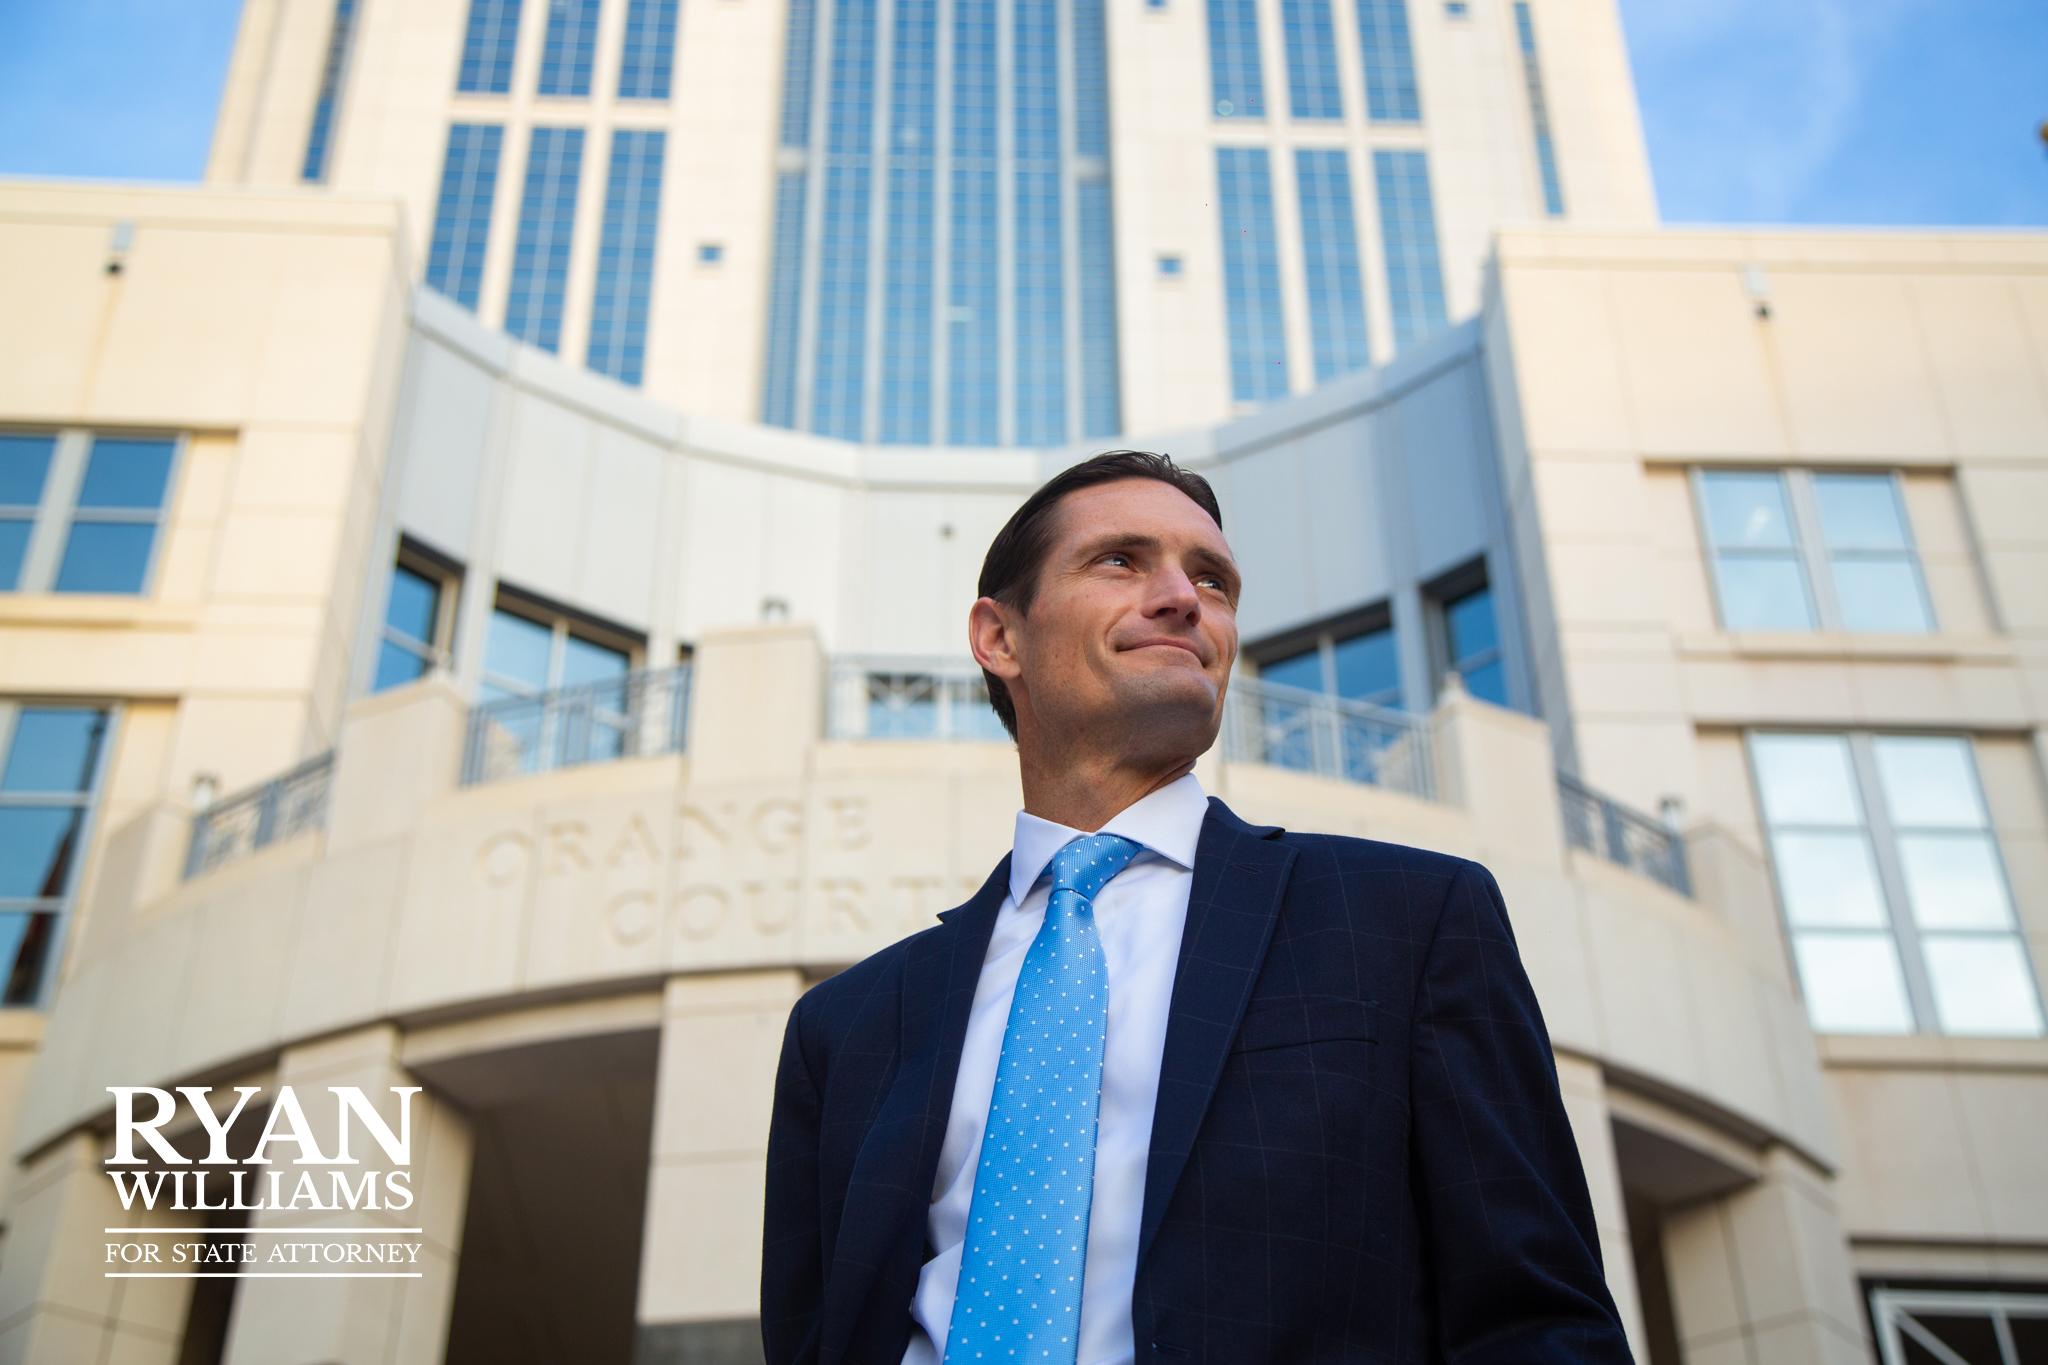 Ryan Williams for State Attorney - Ryan Headshot